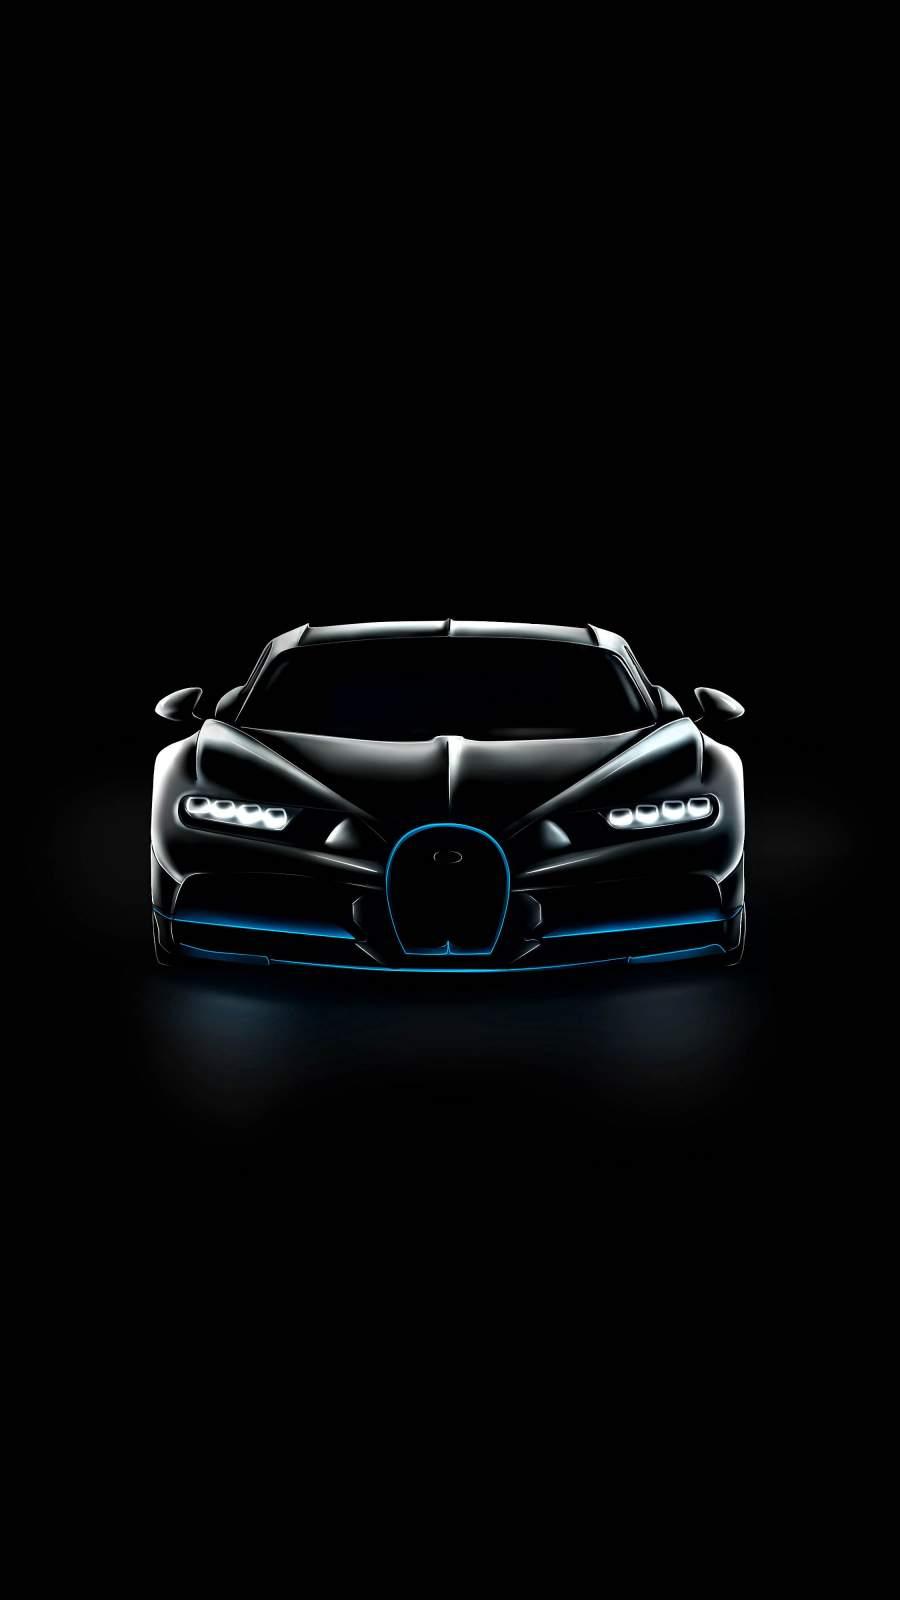 Bugatti Chiron Black iPhone Wallpaper